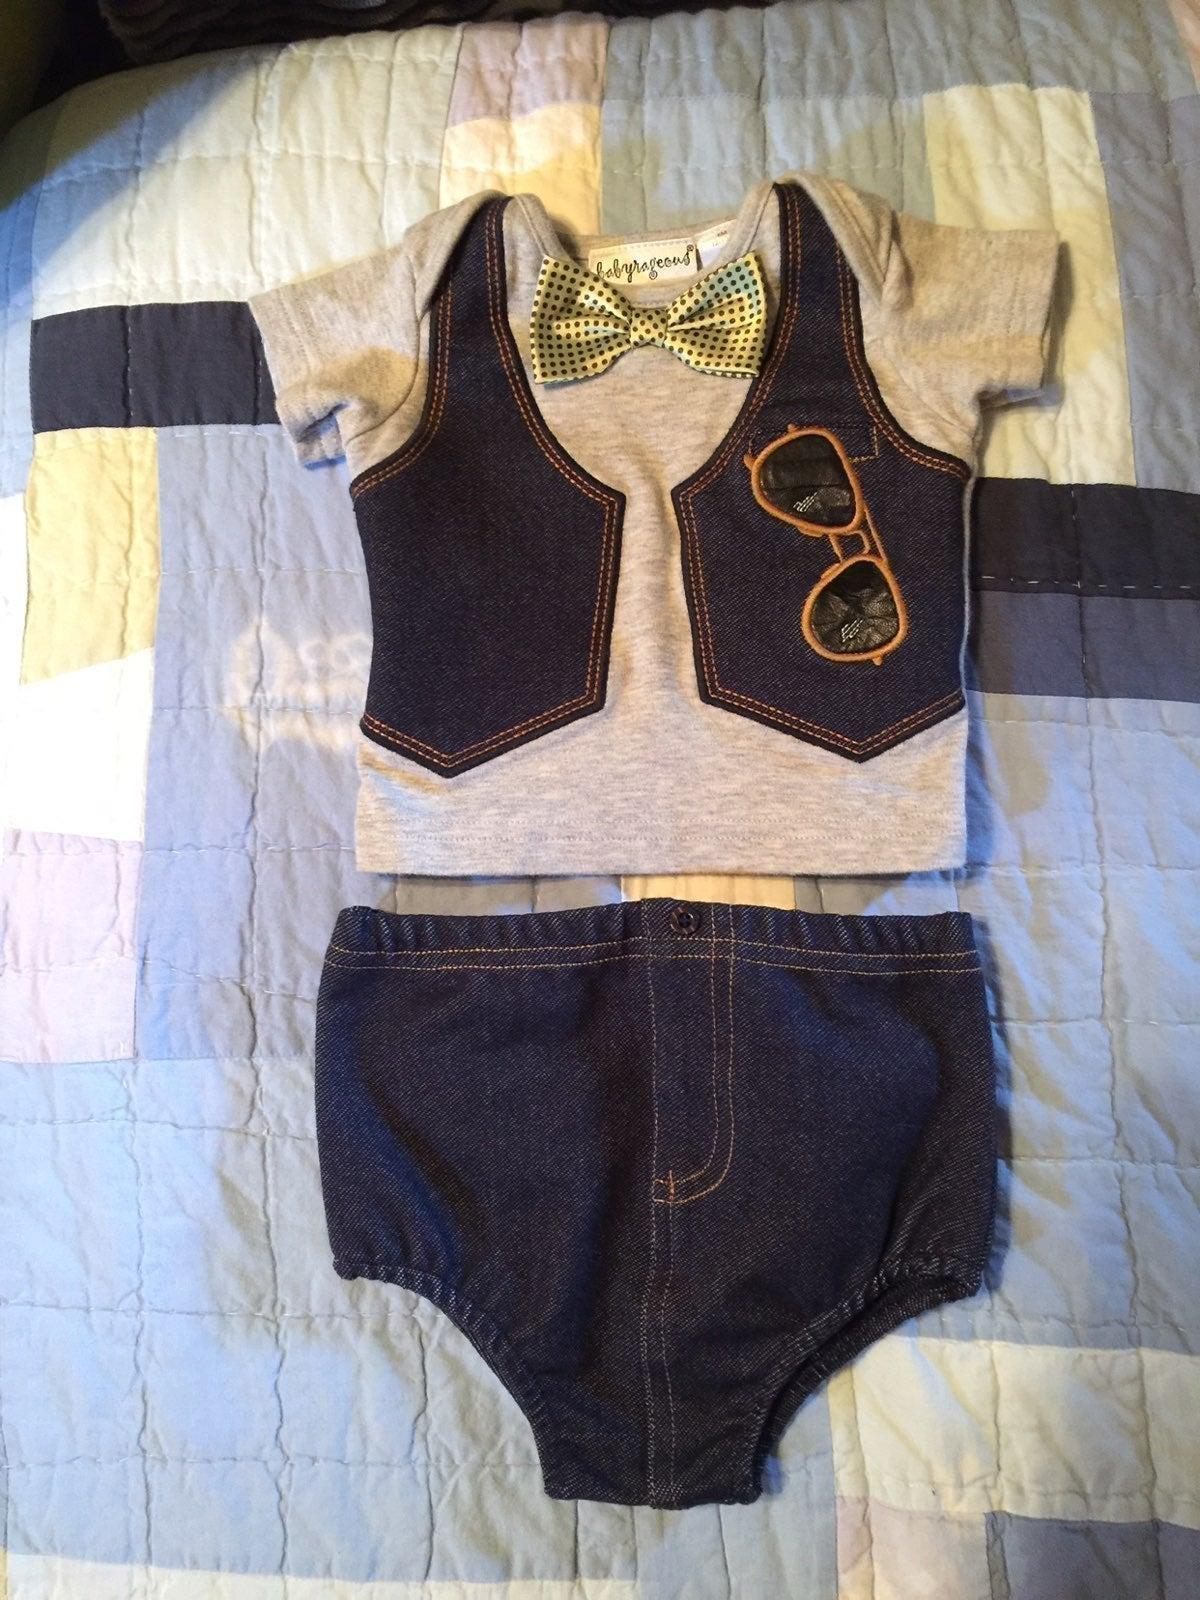 Babyrageous 6M Top w/ jean diaper cover